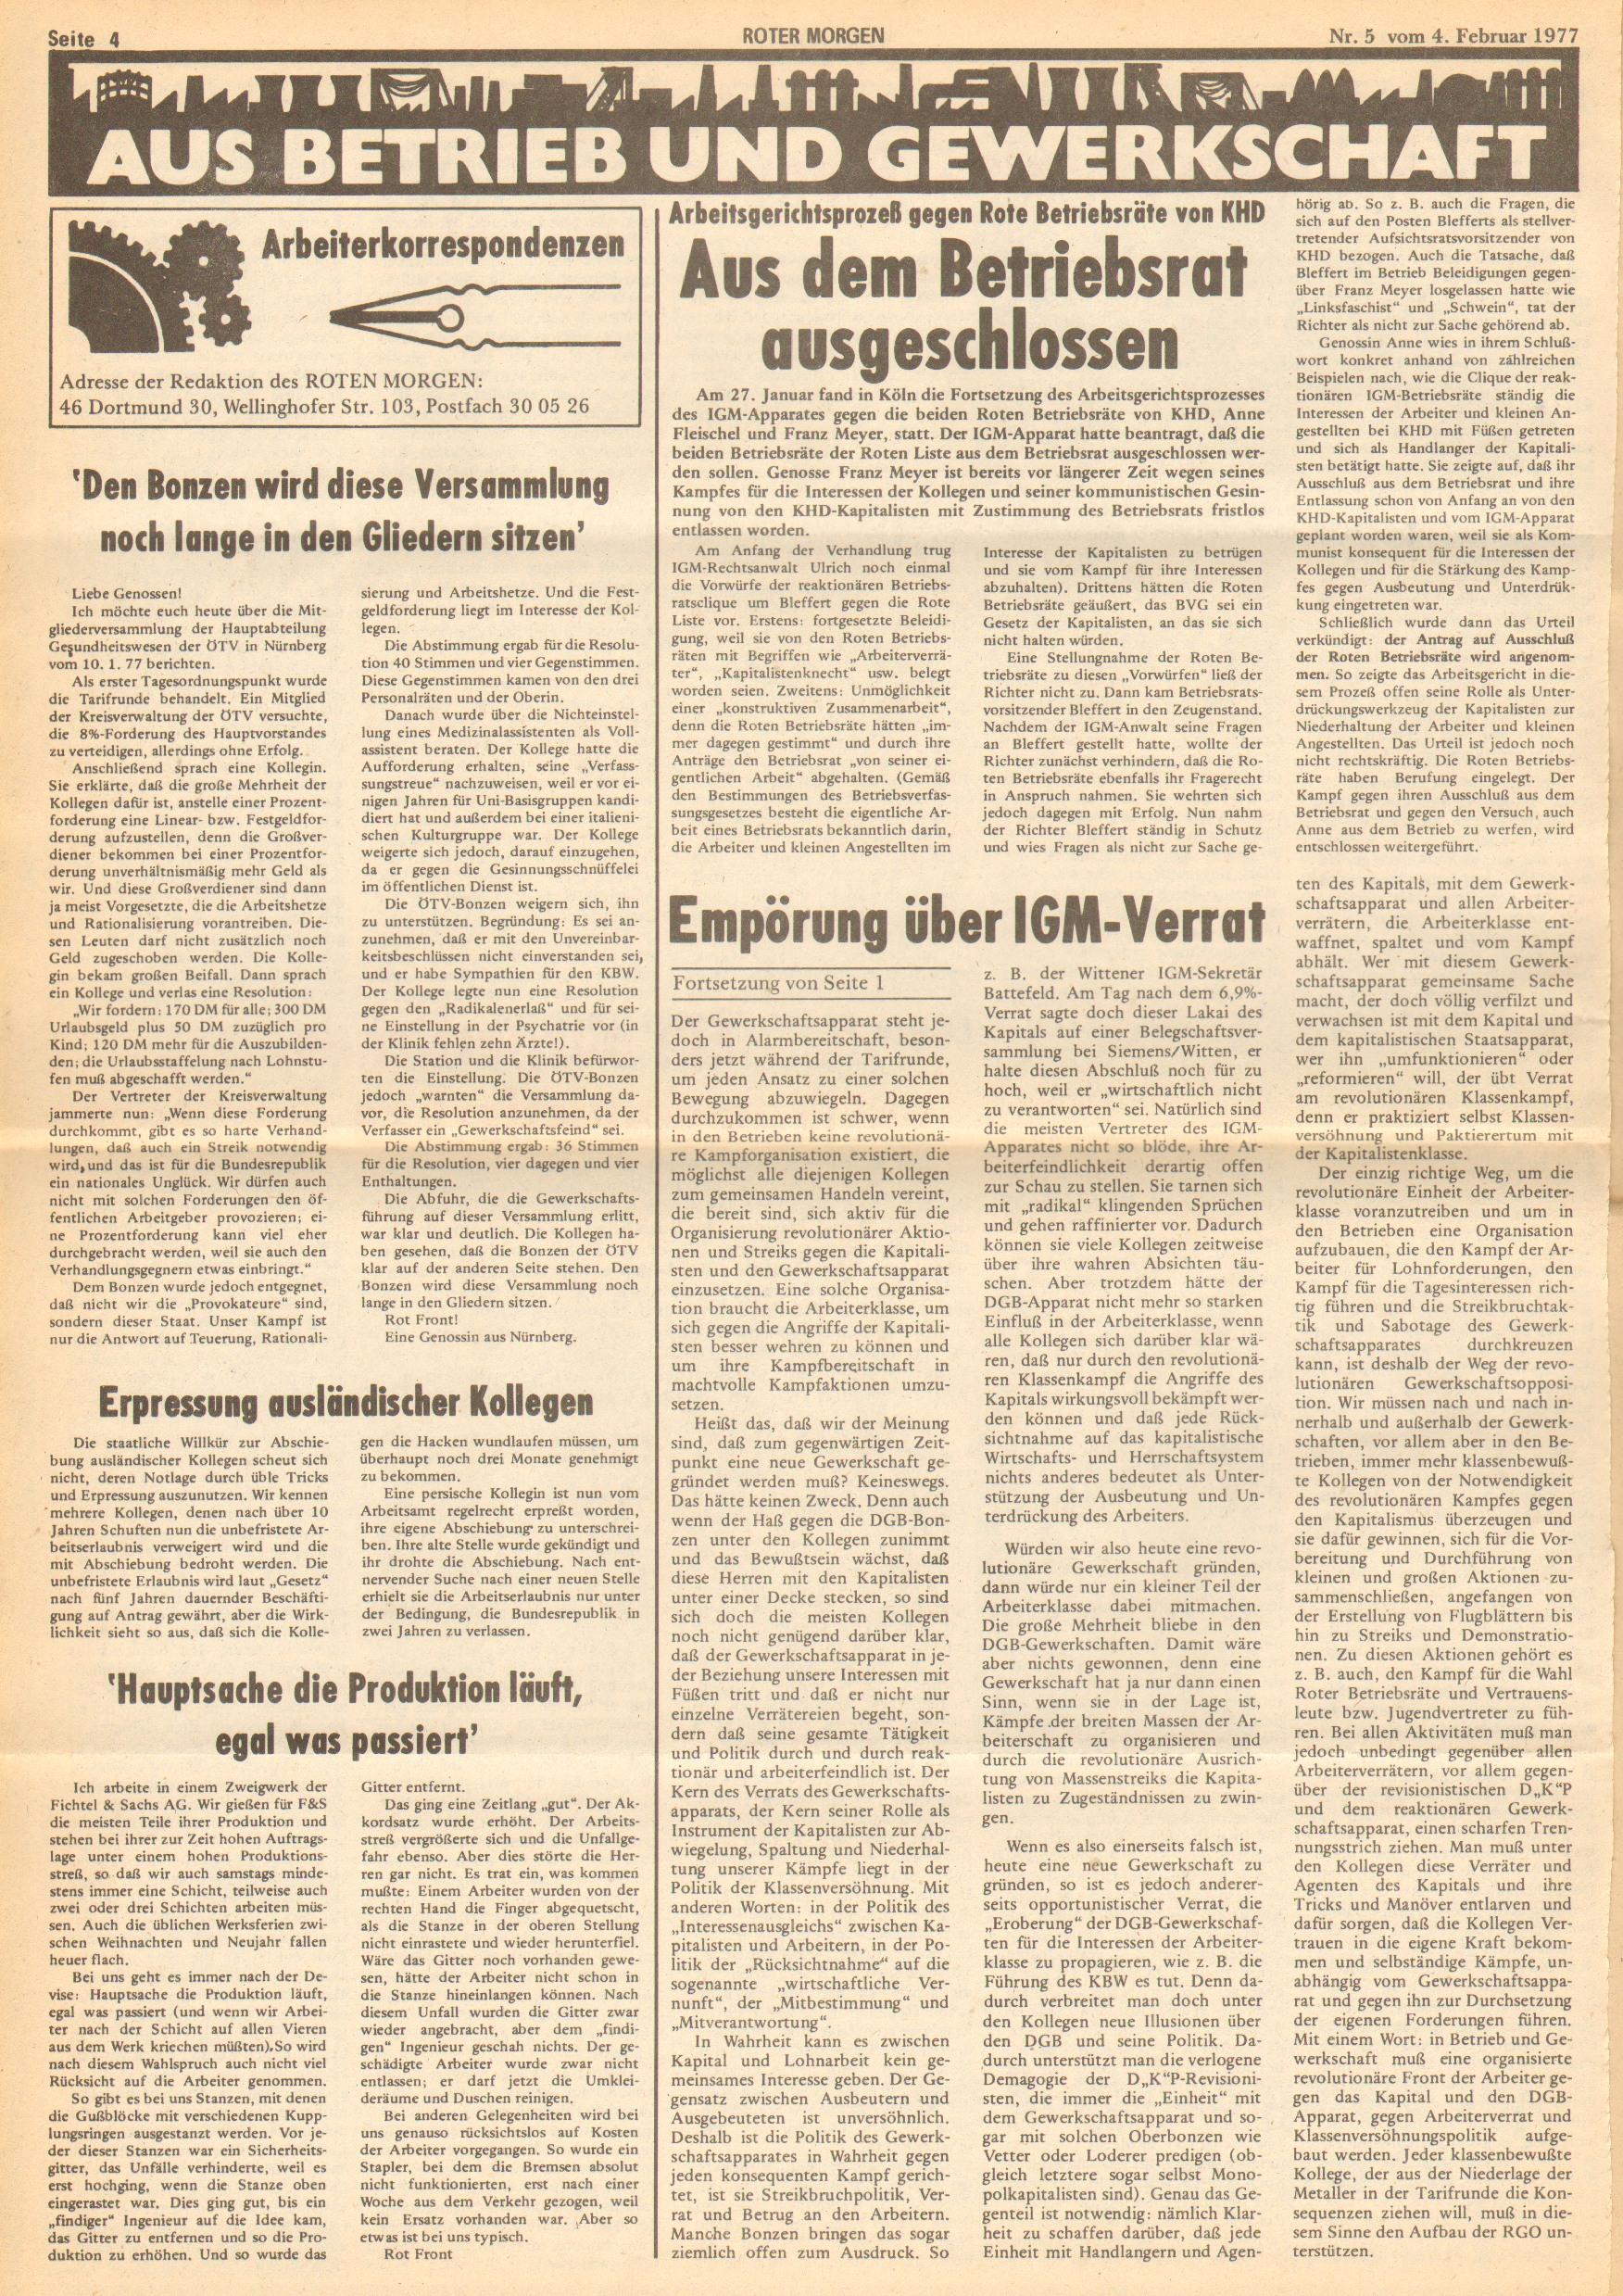 Roter Morgen, 11. Jg., 4. Februar 1977, Nr. 5, Seite 4